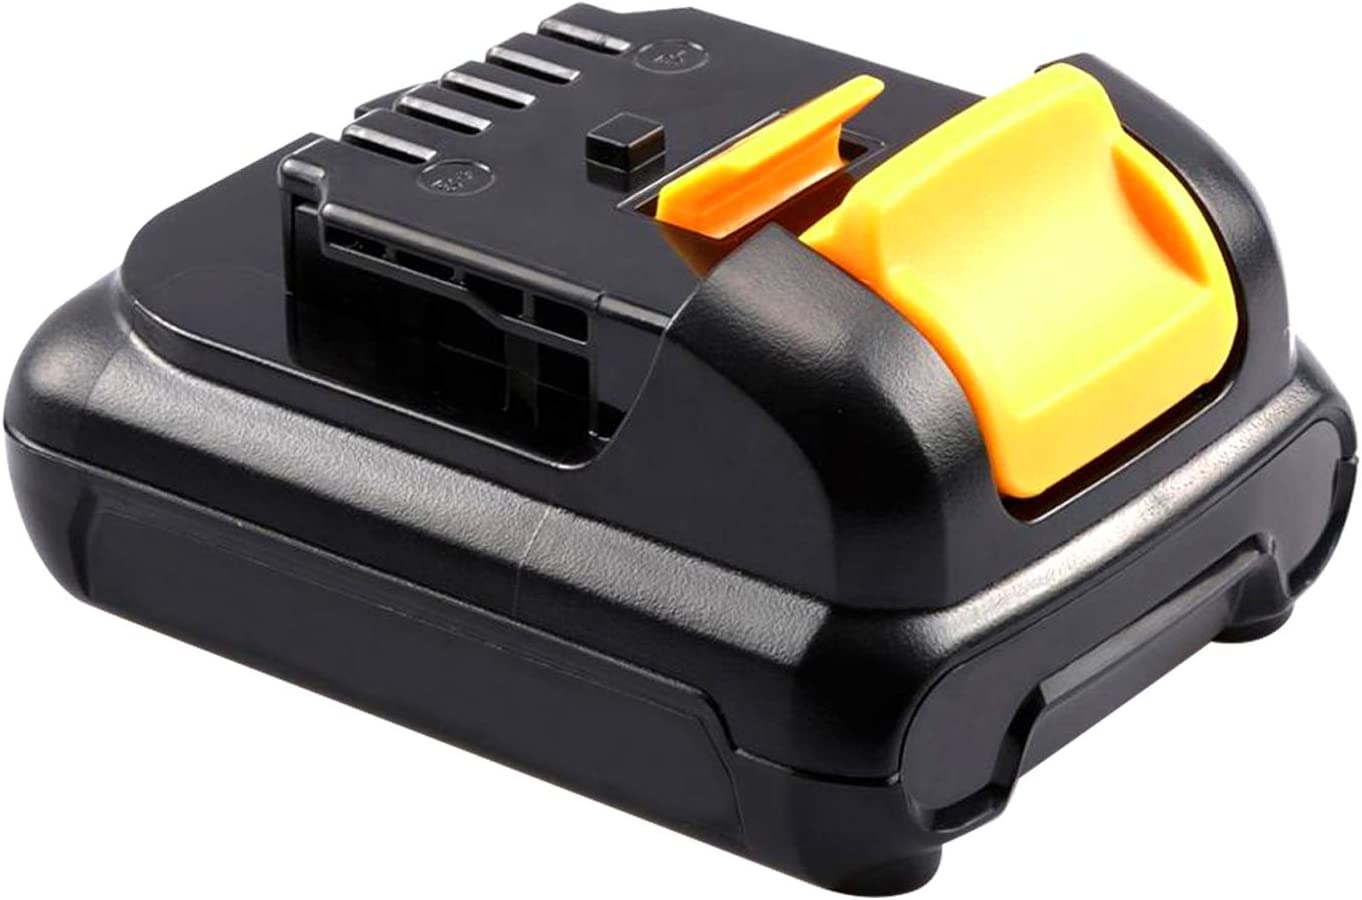 12v Battery Replacement for DCB120 DCB127 Dewalt 12V Max Li-ion Cordless Power Tools (1)